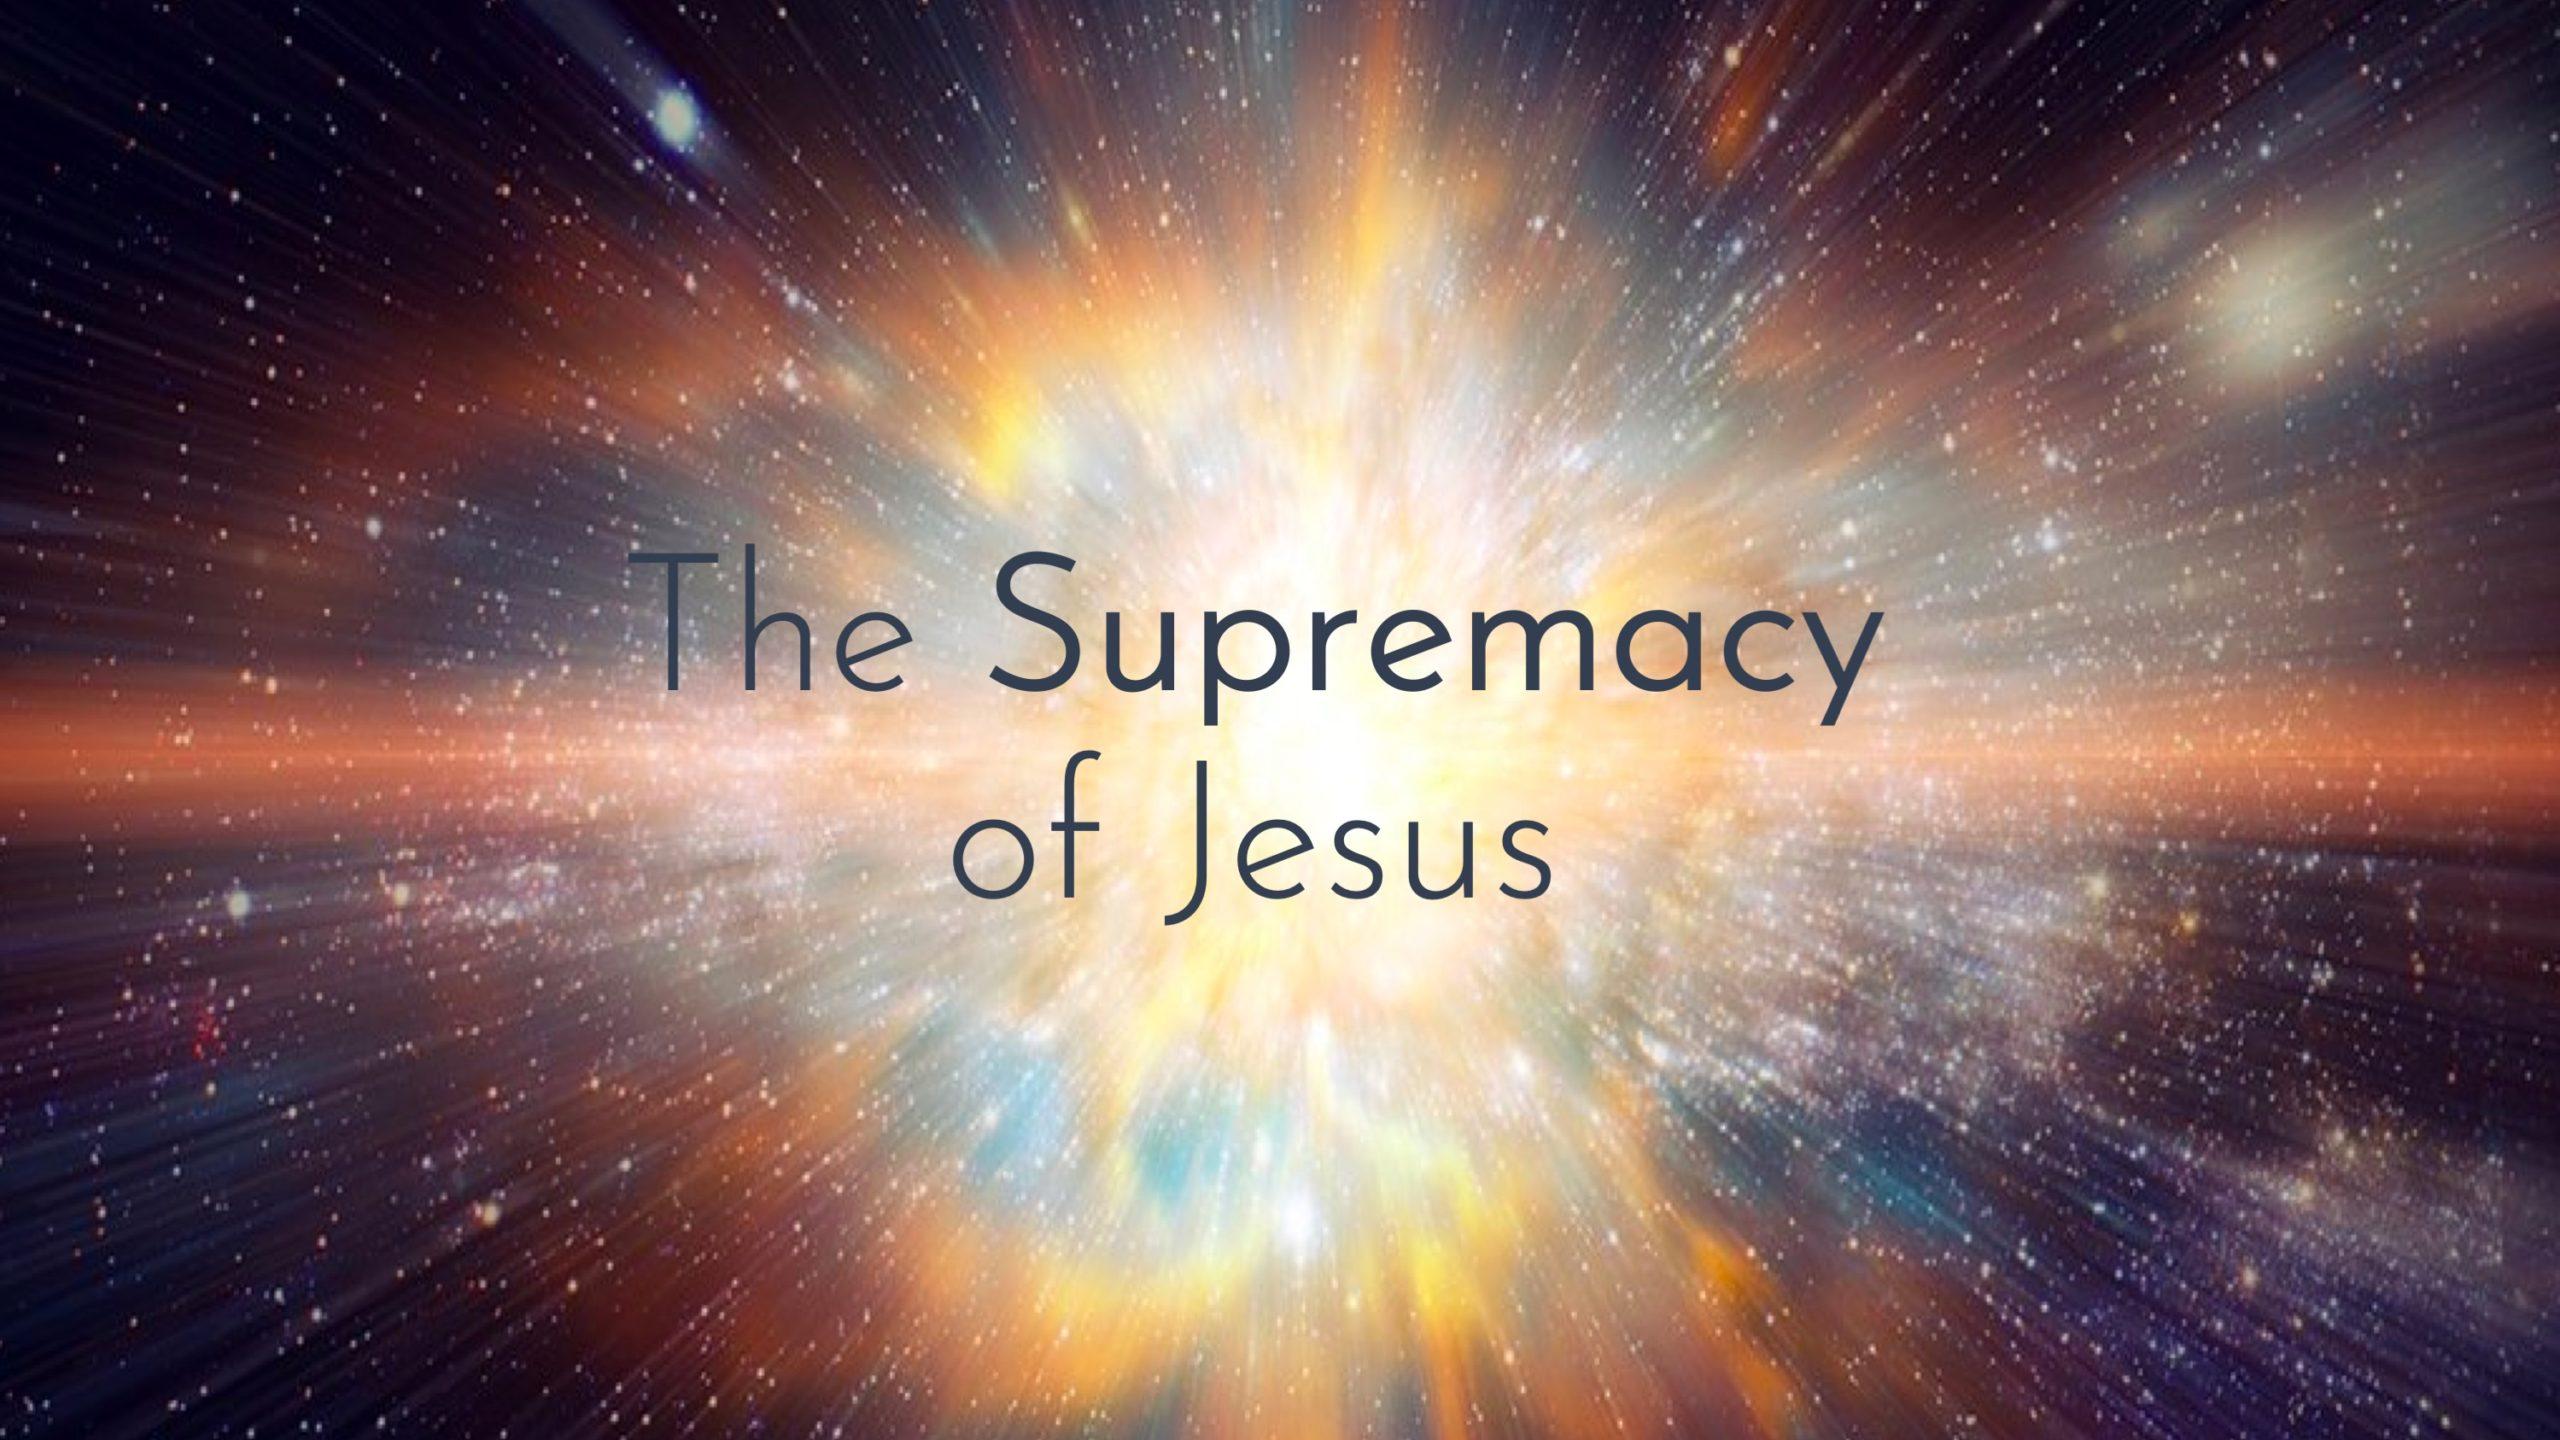 The Supremacy of Jesus